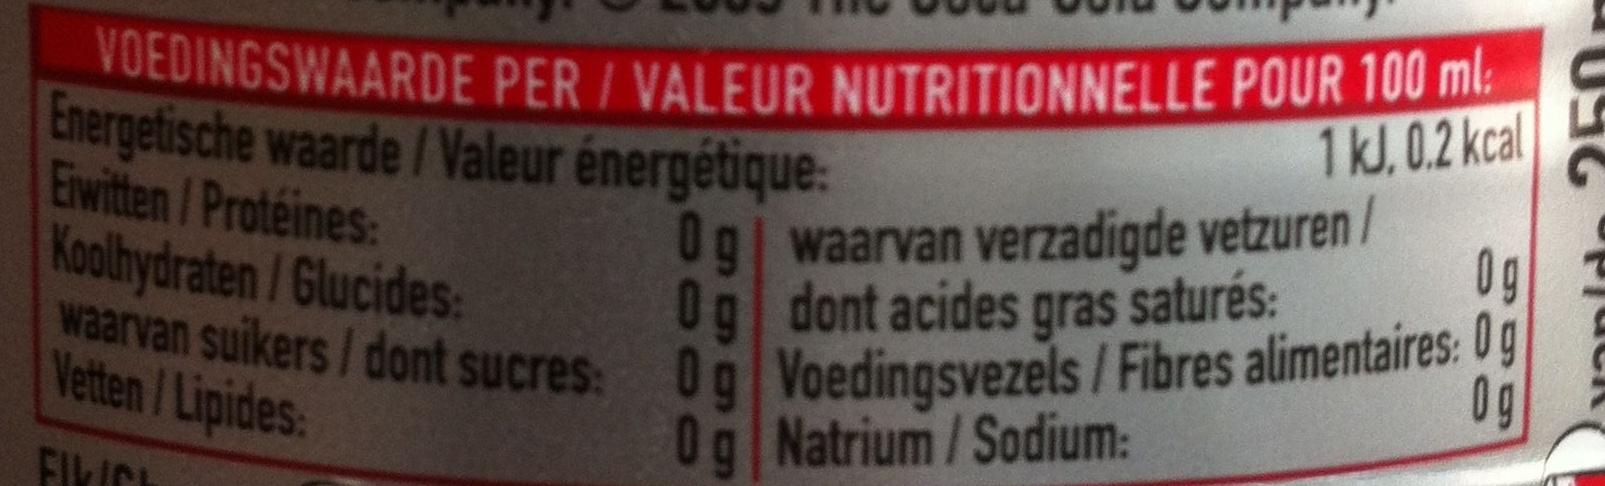 Coca-cola light - Nutrition facts - fr